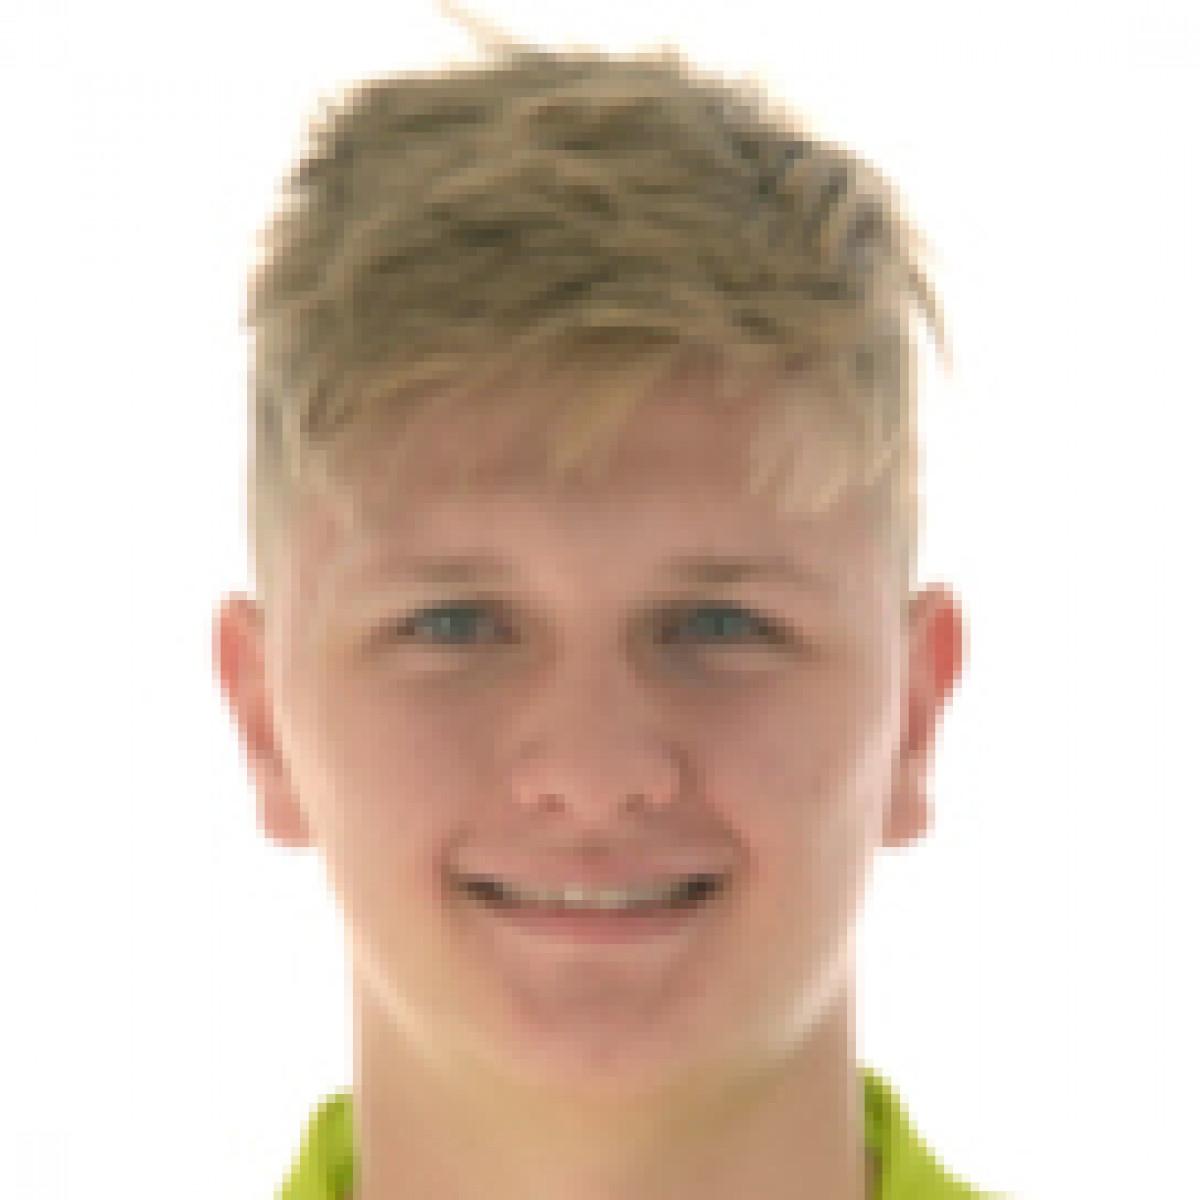 Lucas Loth